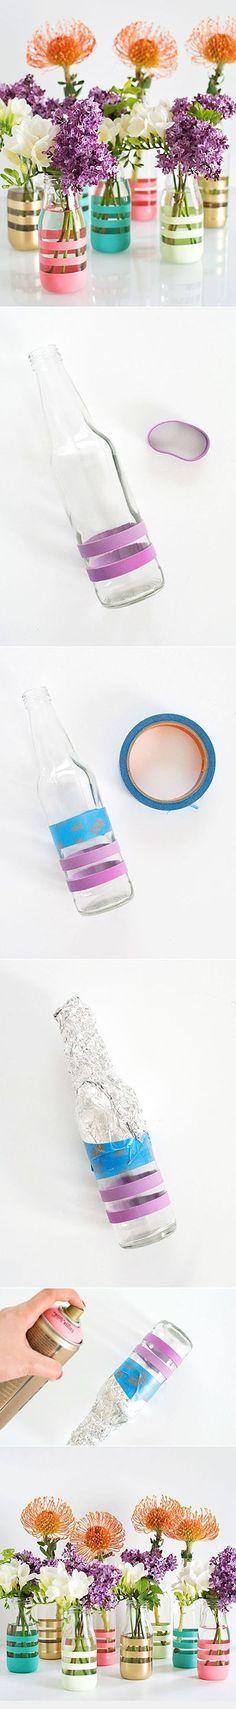 Make Upcycling Glass Bottles Into Vases